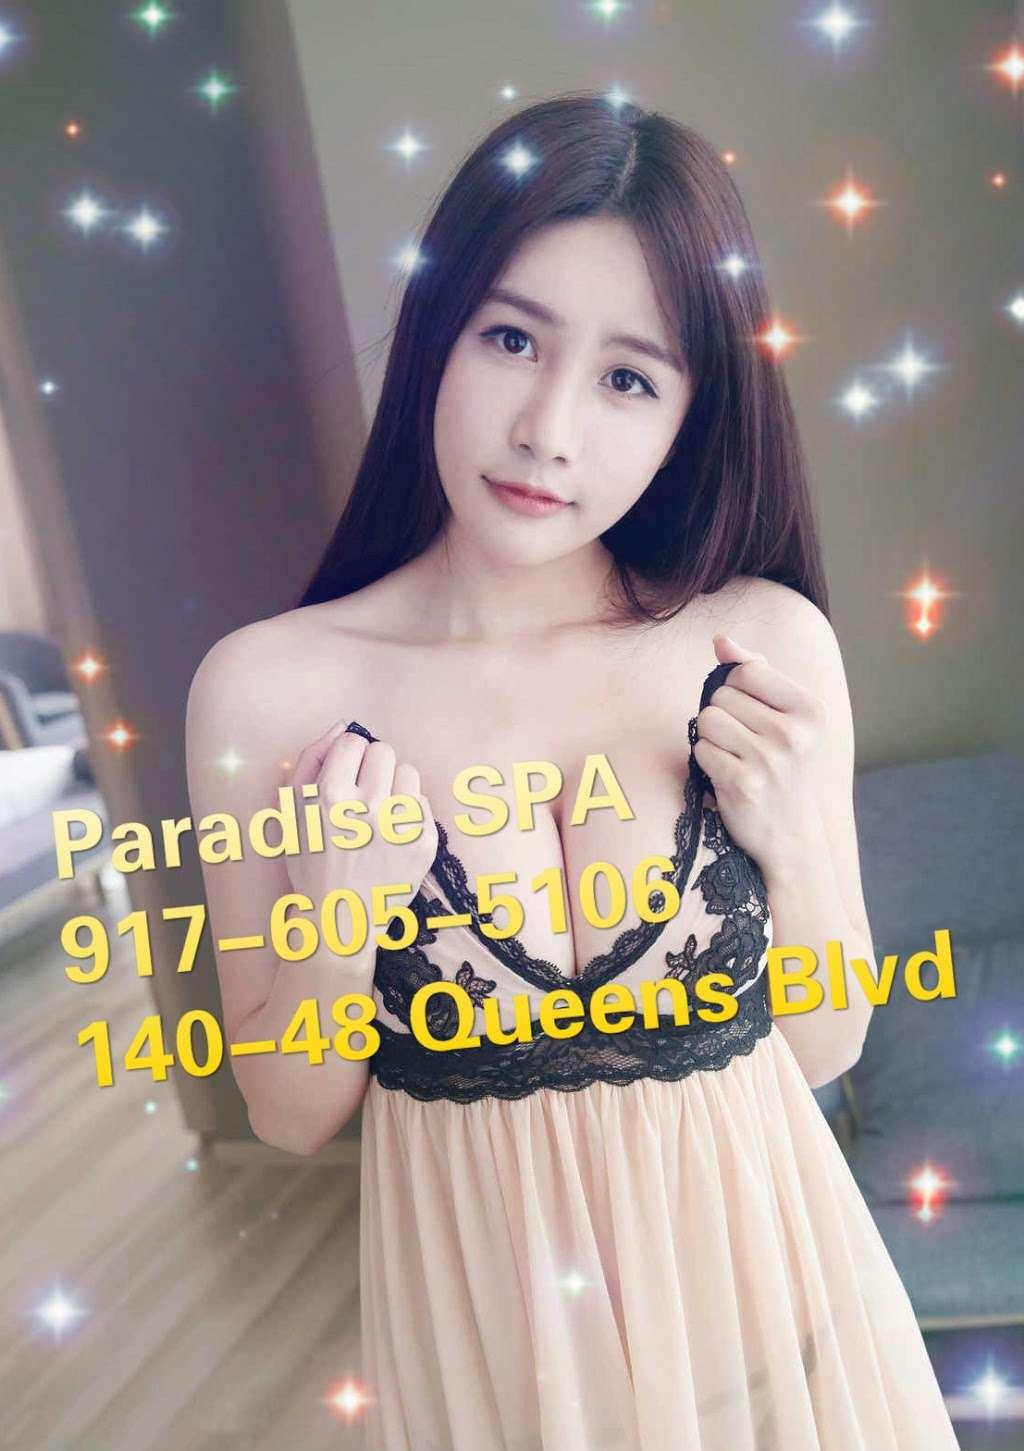 Paradise Island Spa in jamaica - spa  | Photo 1 of 9 | Address: 140-48 Queens Blvd, Jamaica, NY 11435, USA | Phone: (917) 605-5106